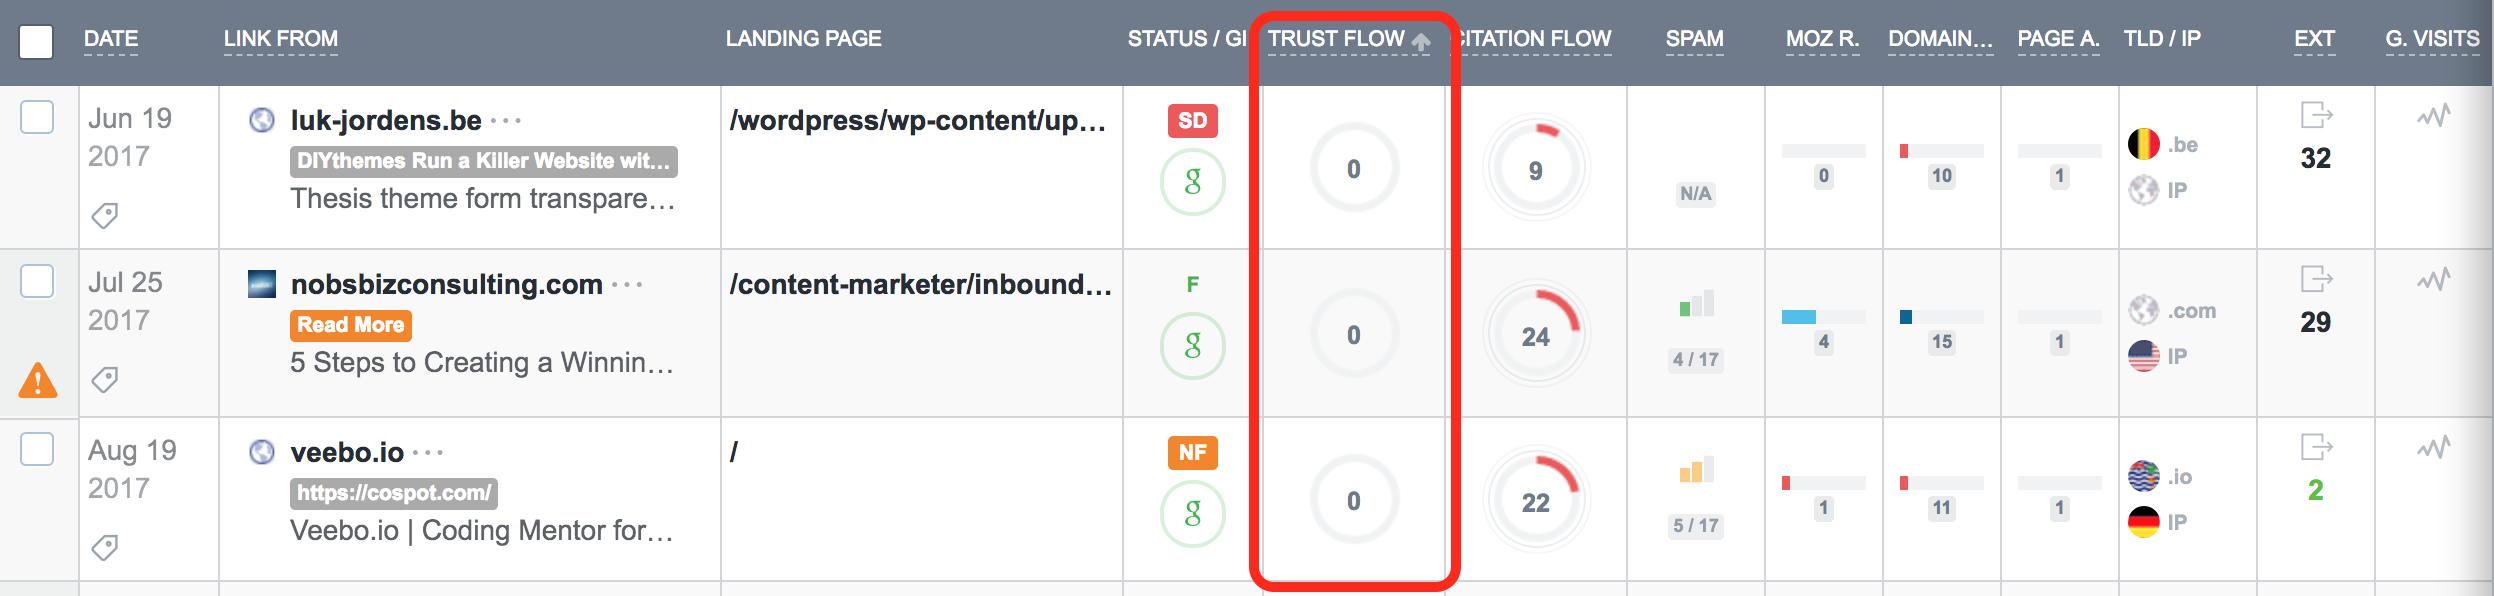 trust-flow